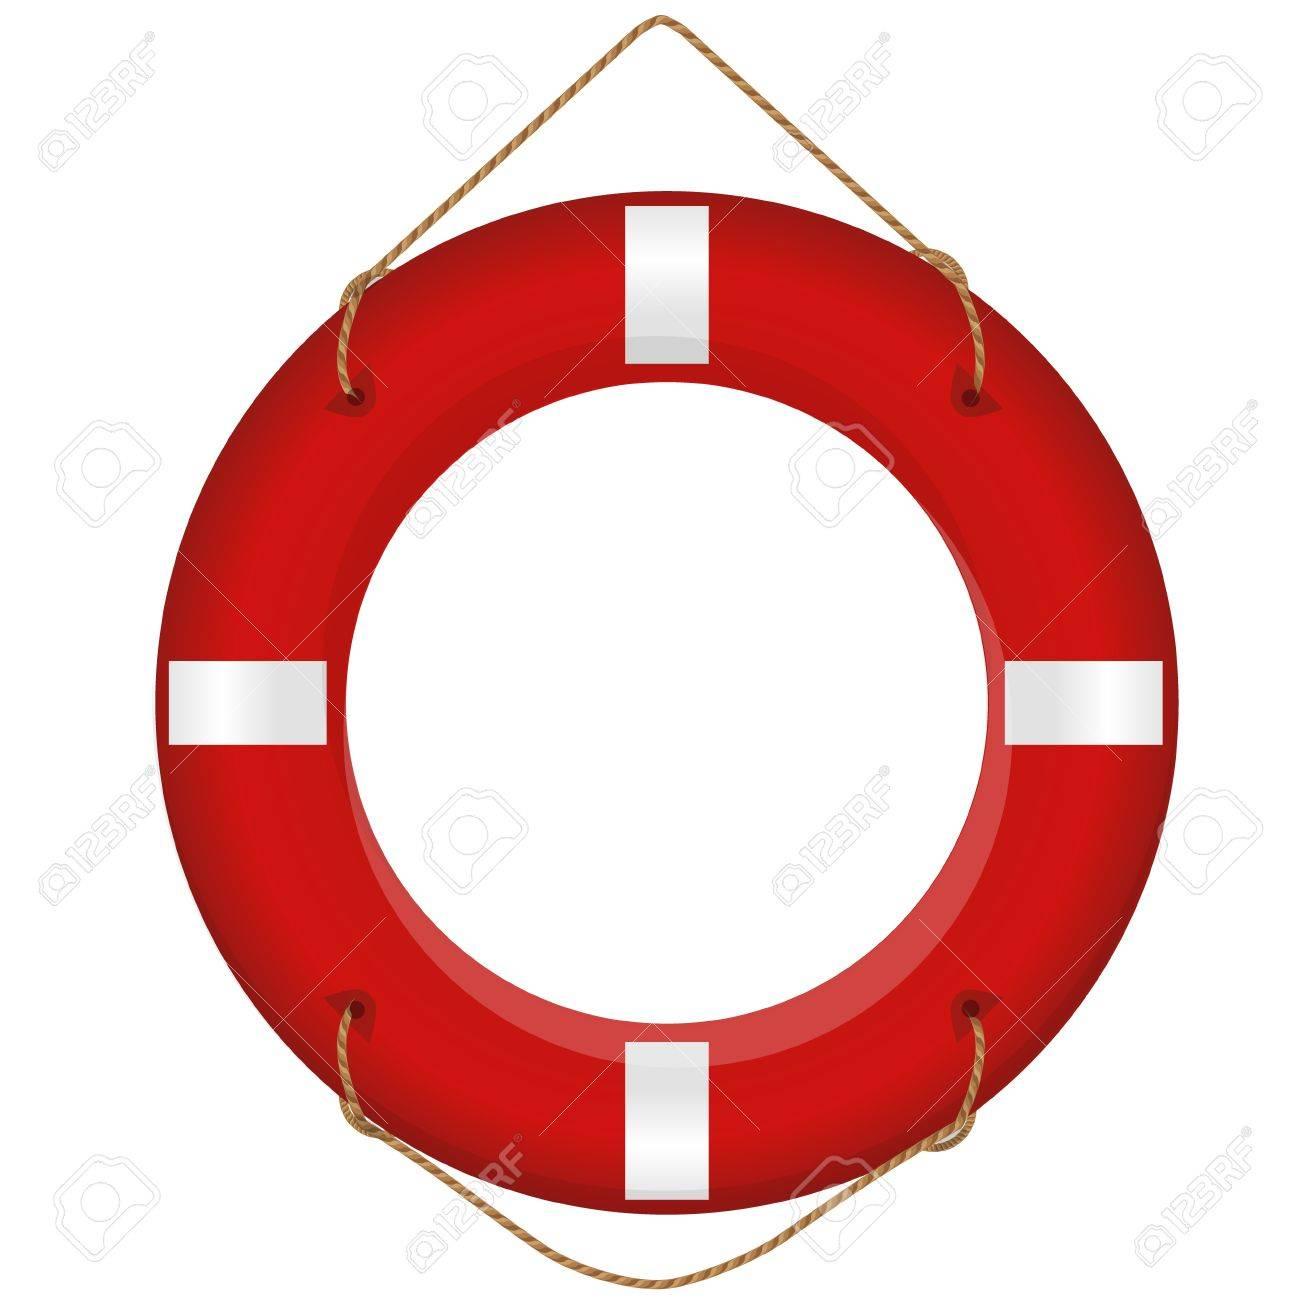 lifebuoy Stock Vector - 11580257